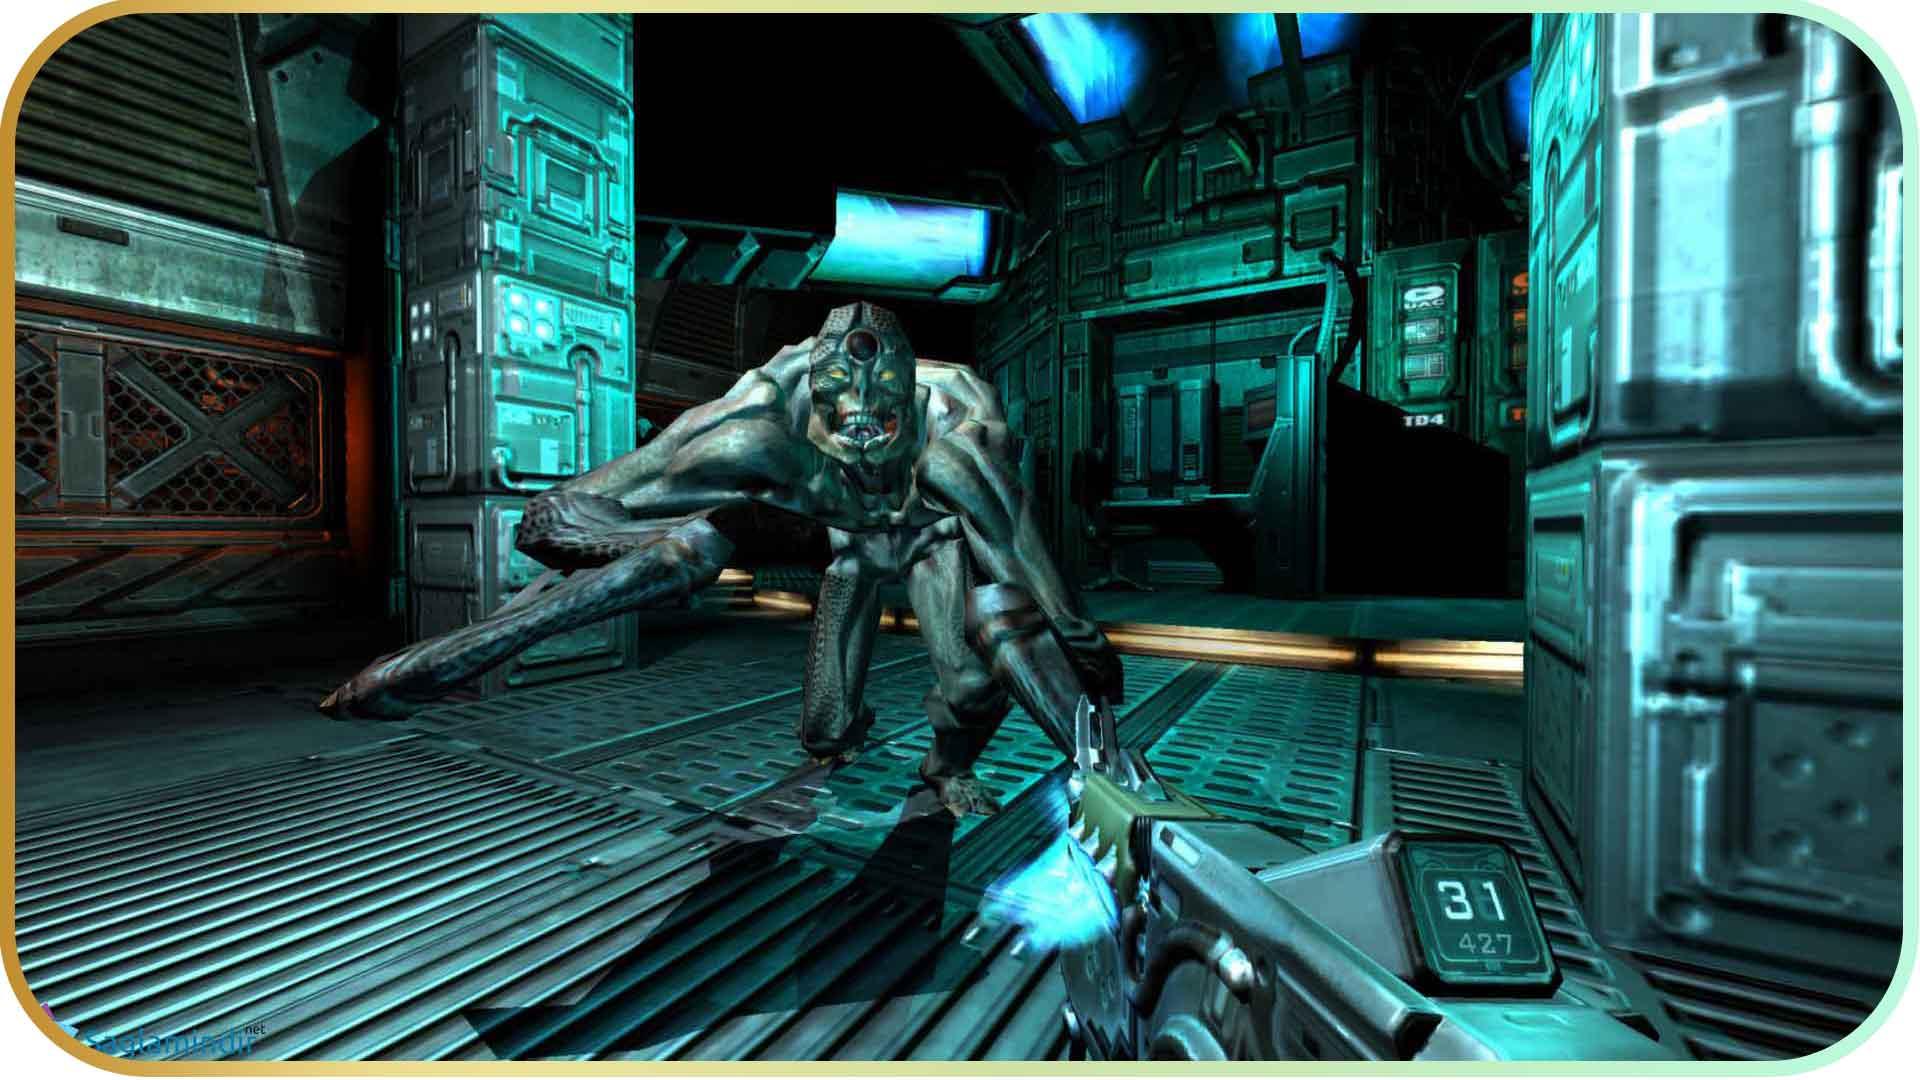 Doom 3 BFG Edition saglamindir